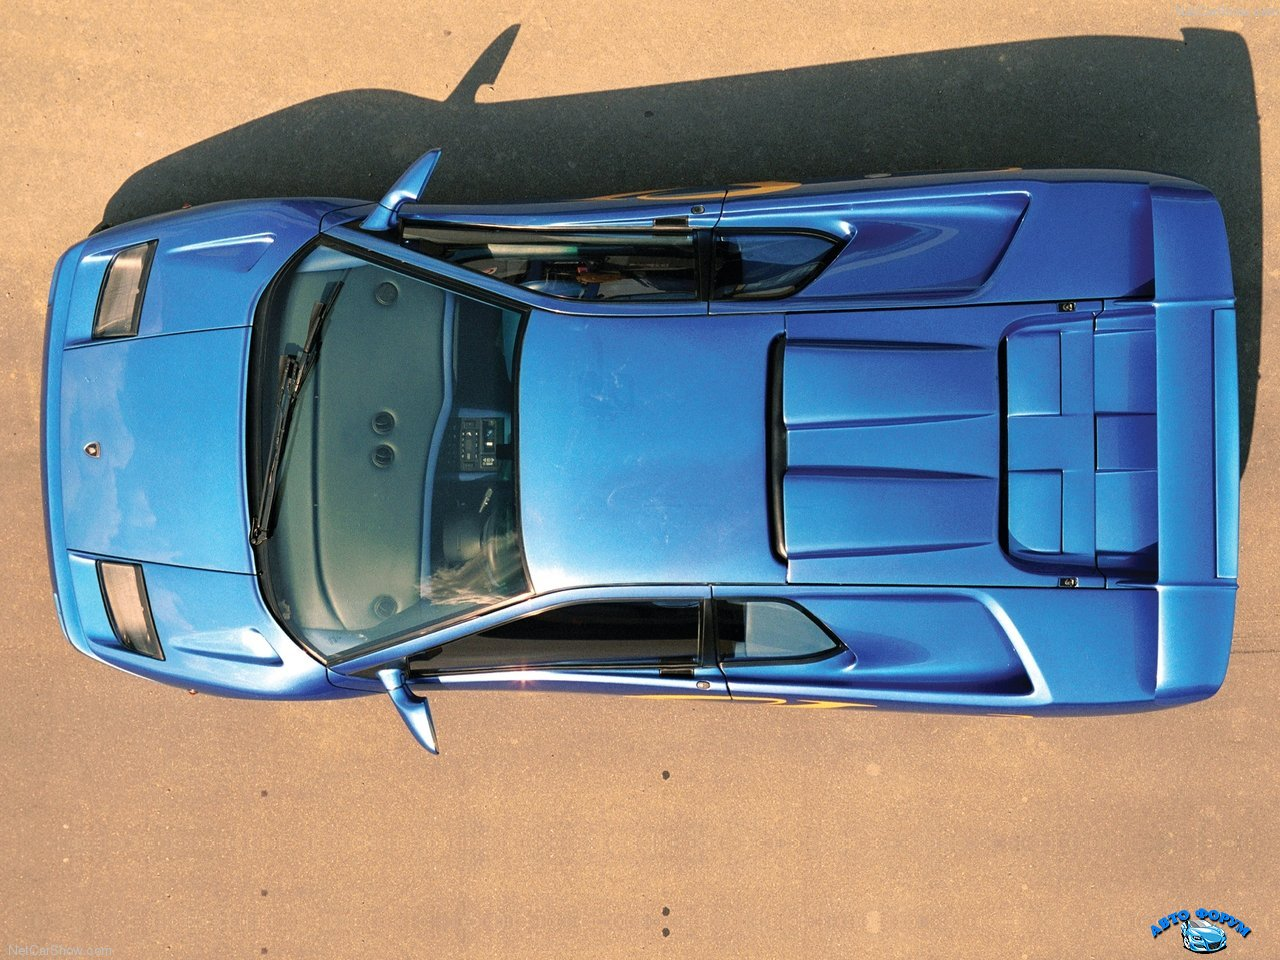 Lamborghini-Diablo_SV_1996_1280x960_wallpaper_04.jpg